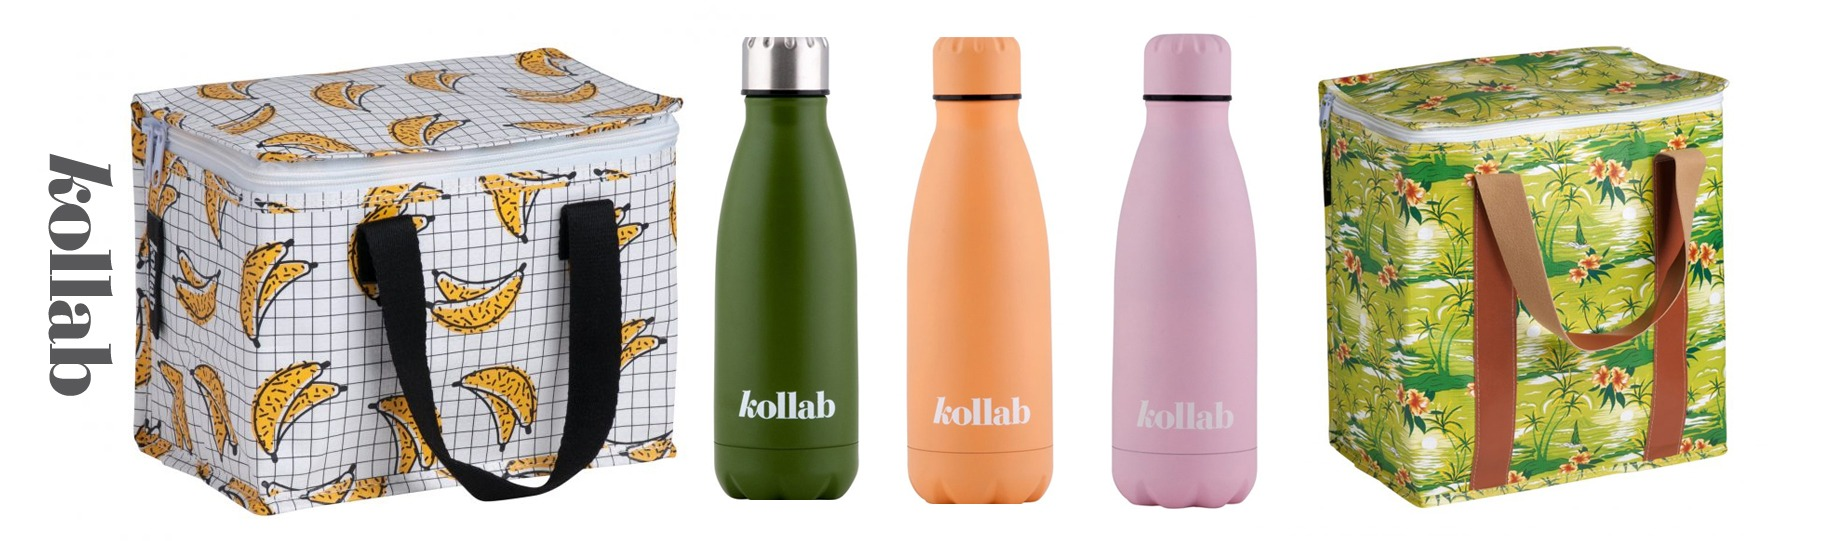 kollab-at-island-collective